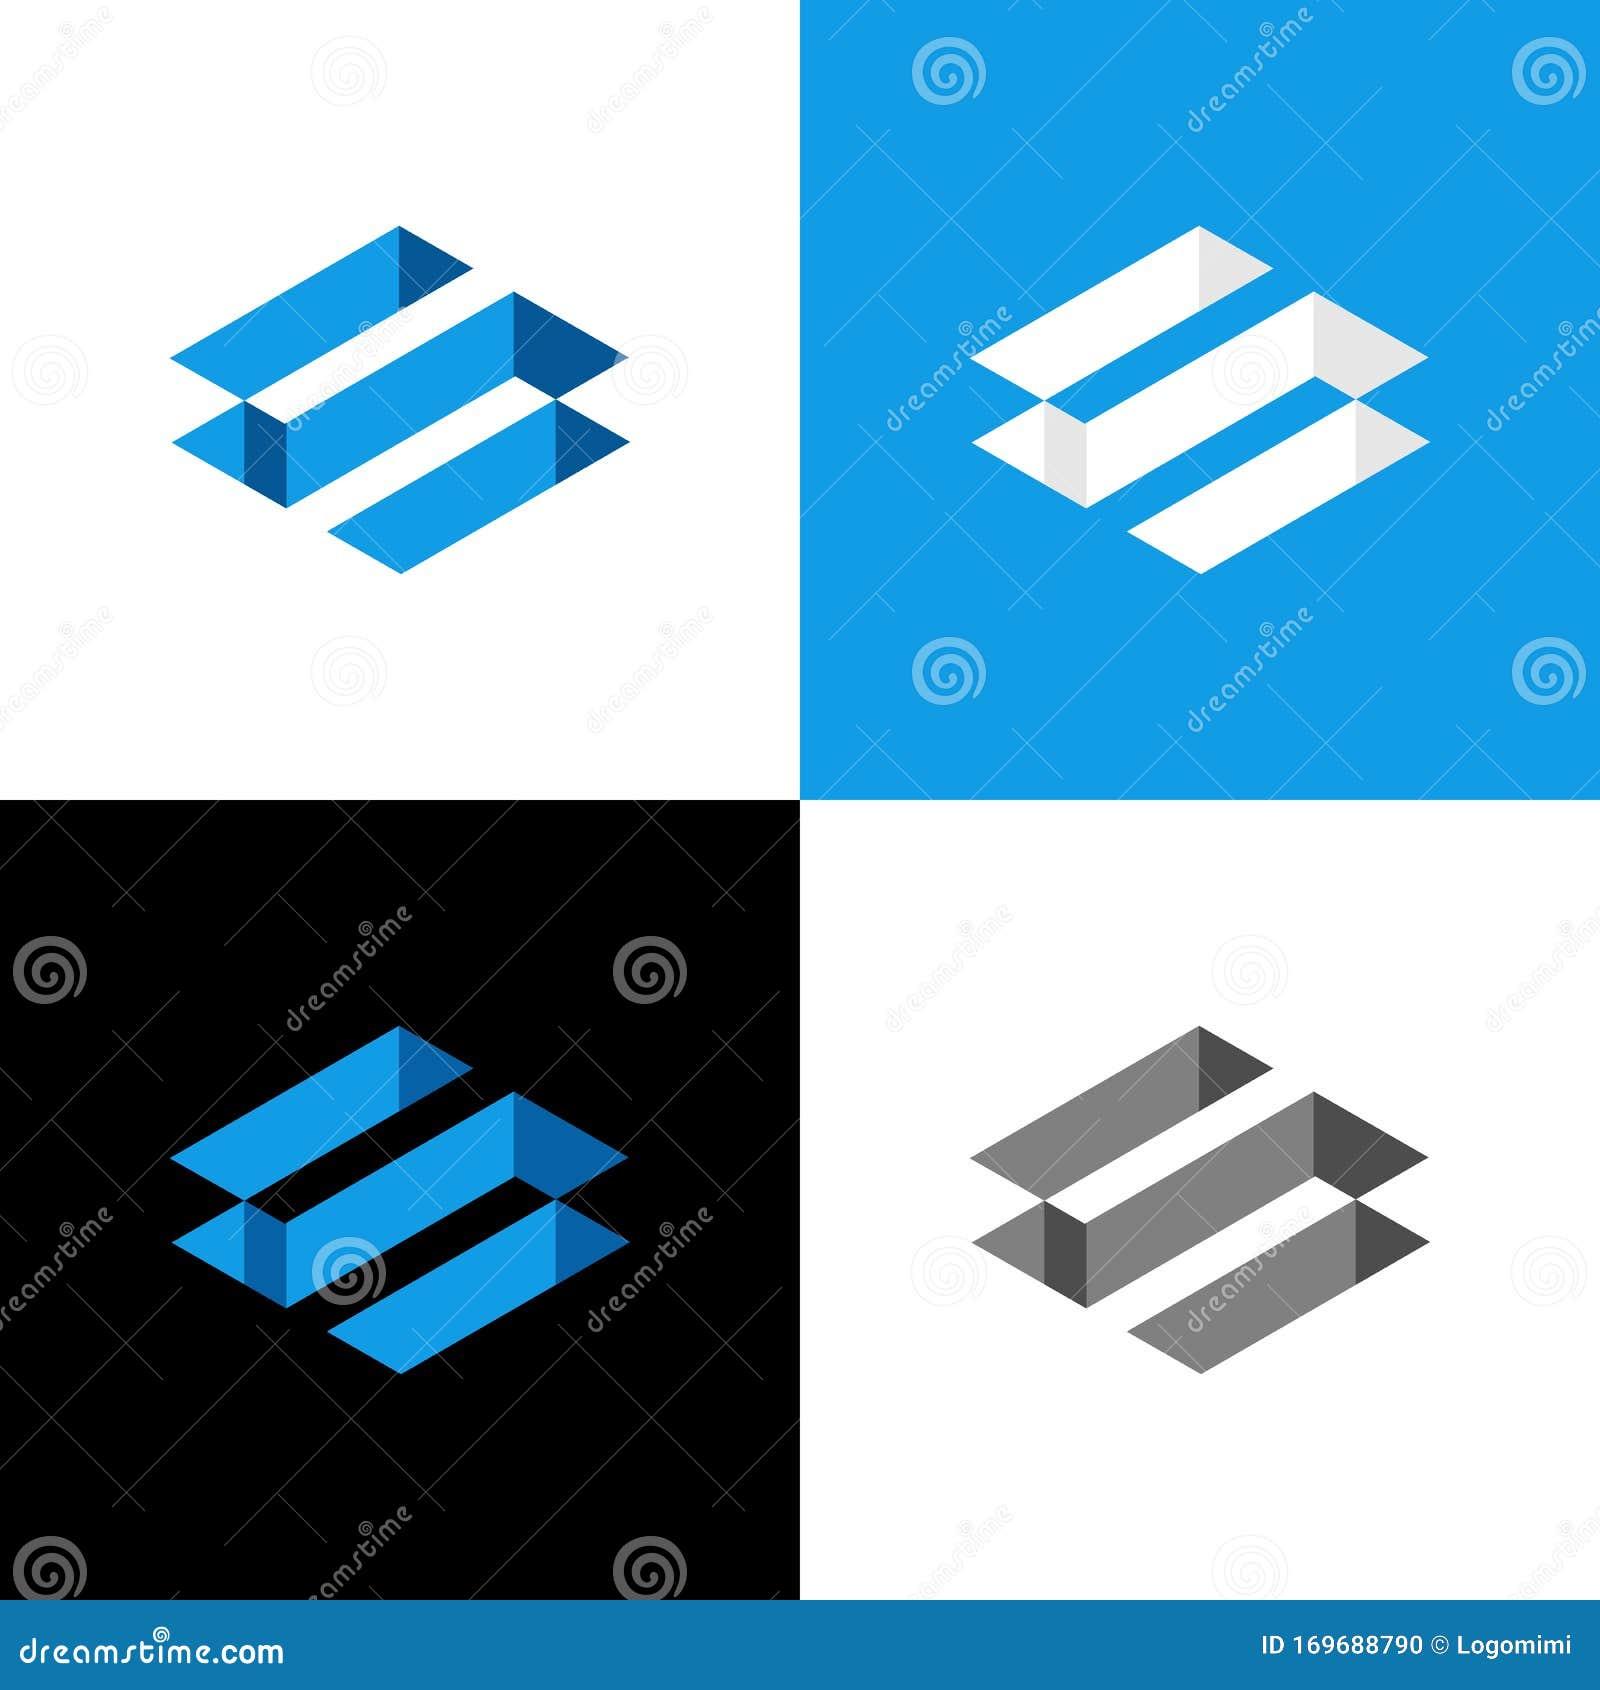 Initial Letter S, 3D Isometric Logo Design Template